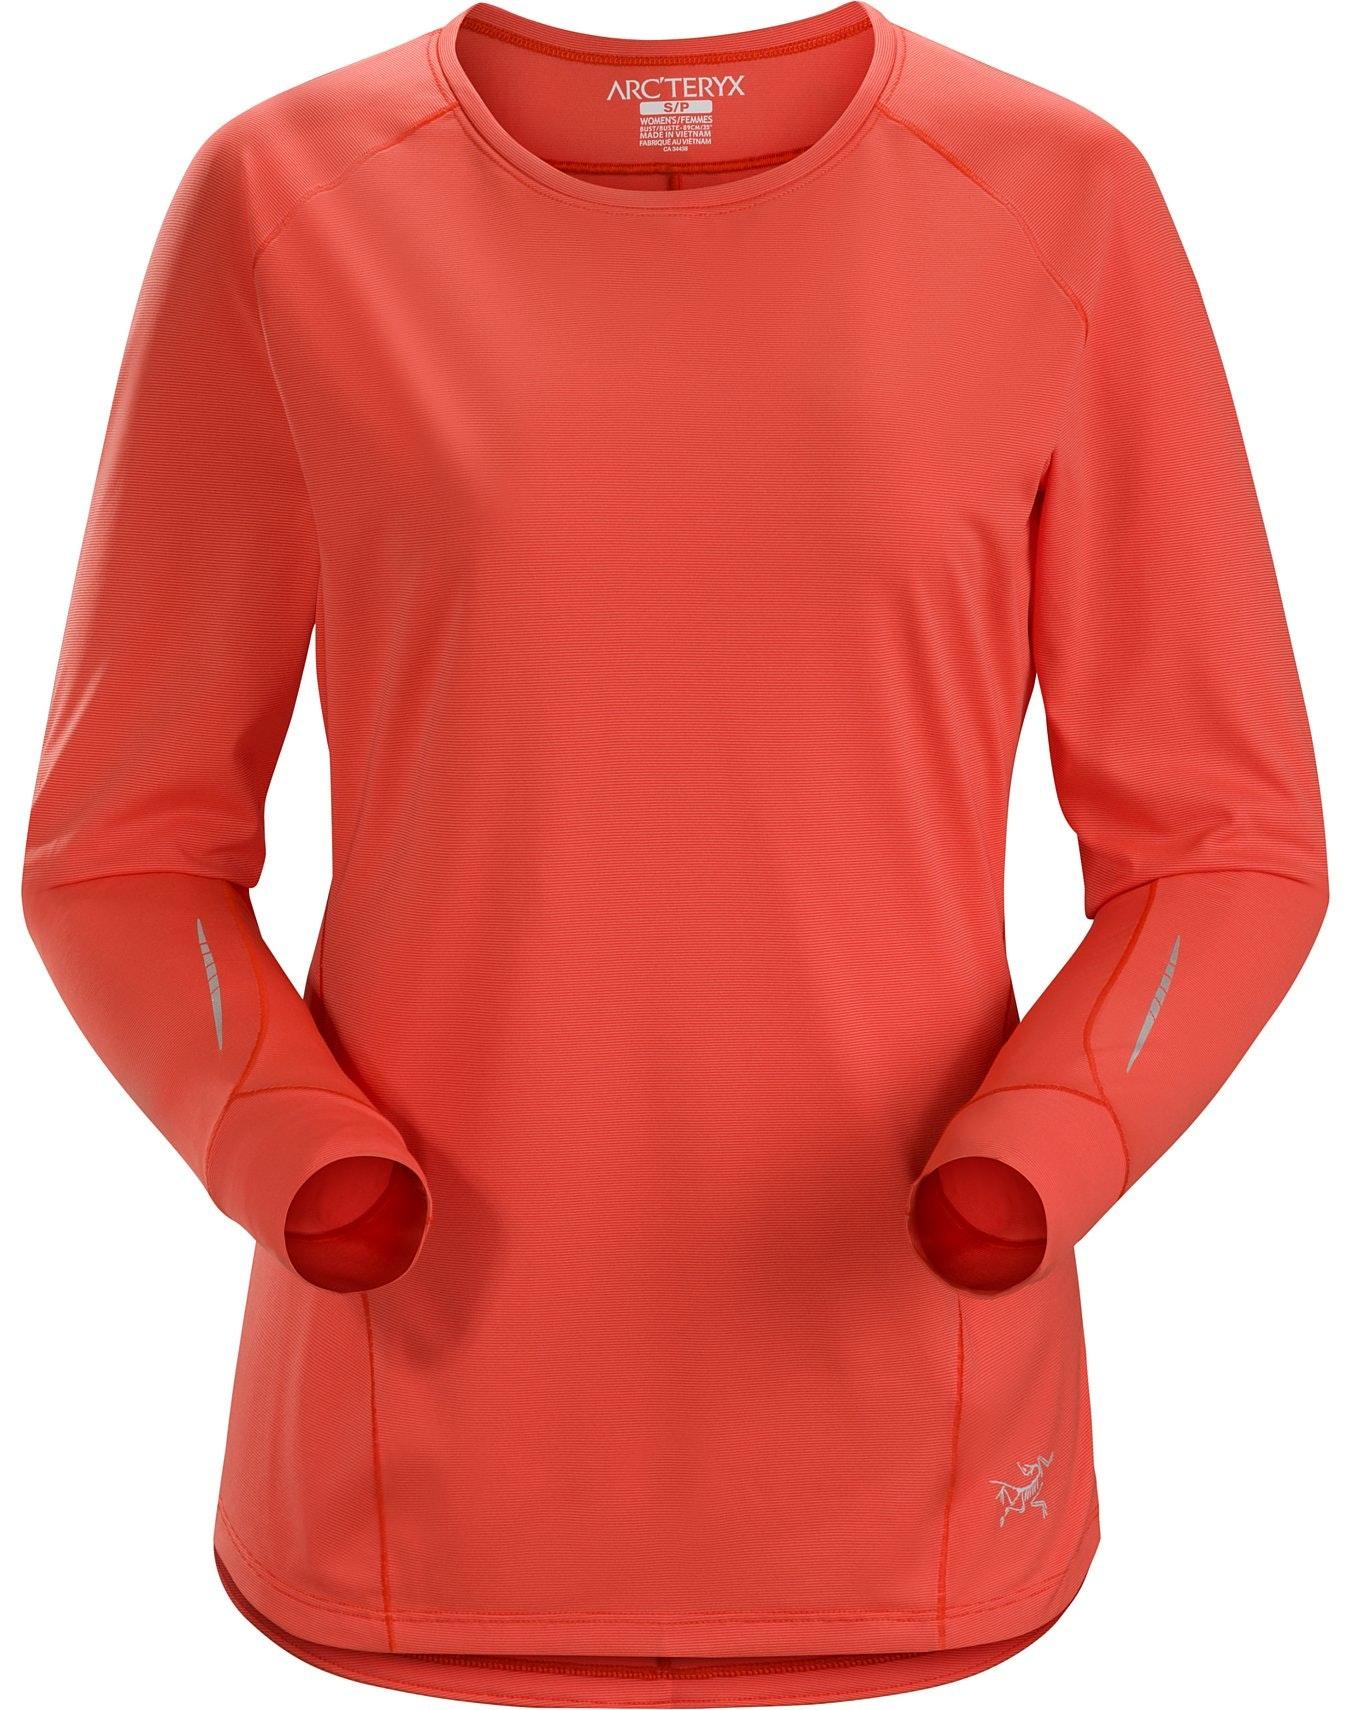 4872697a7 Motus Crew Neck Shirt LS / Womens | Arc'teryx